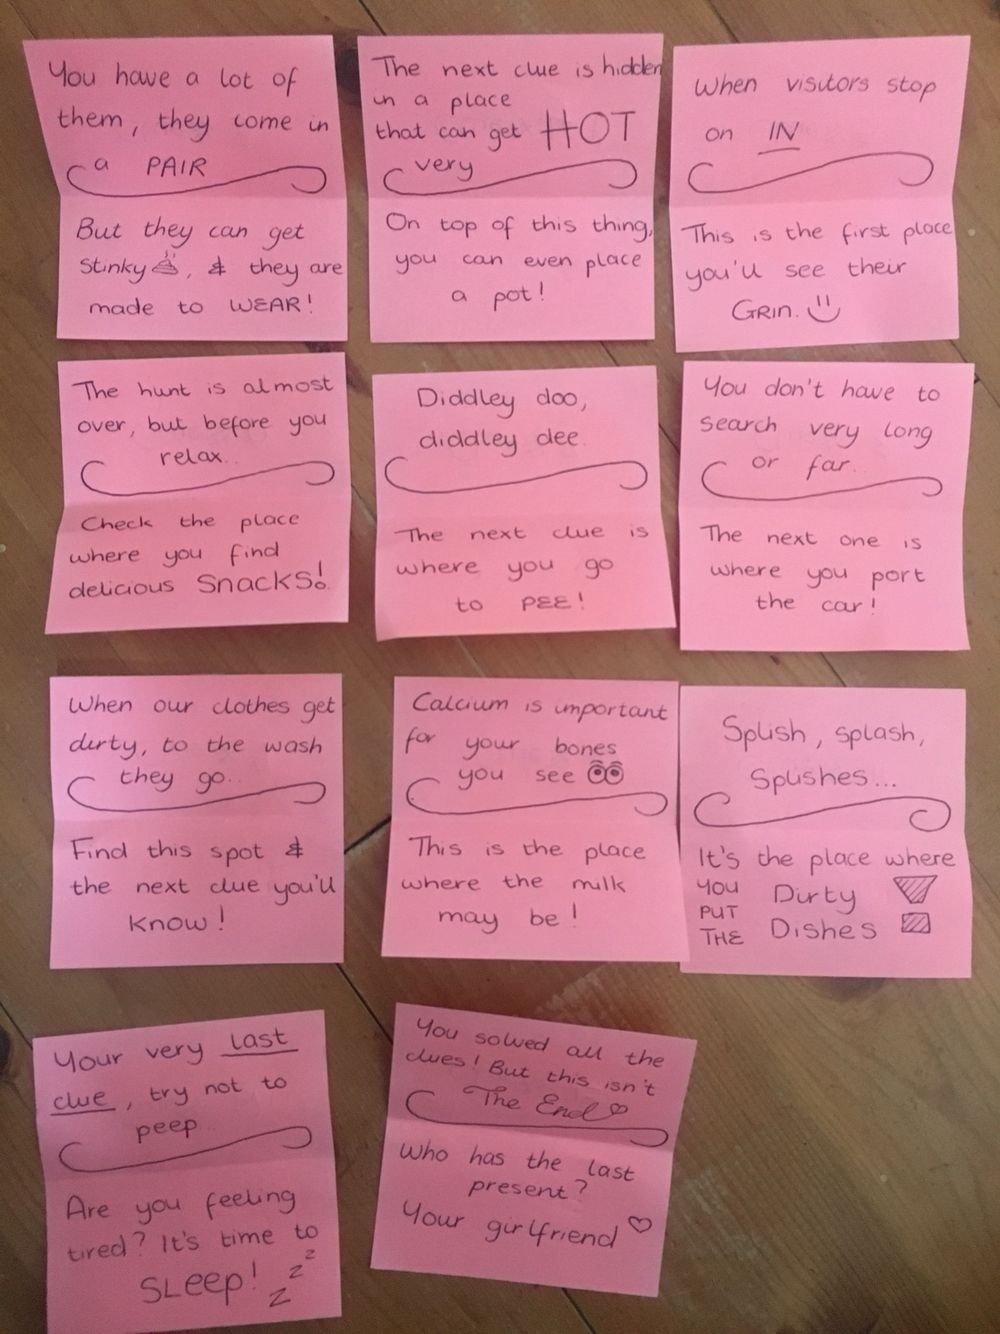 10 Attractive Scavenger Hunt Ideas For Boyfriend birthday treasure hunt for my boyfriends birthday some clues 2021